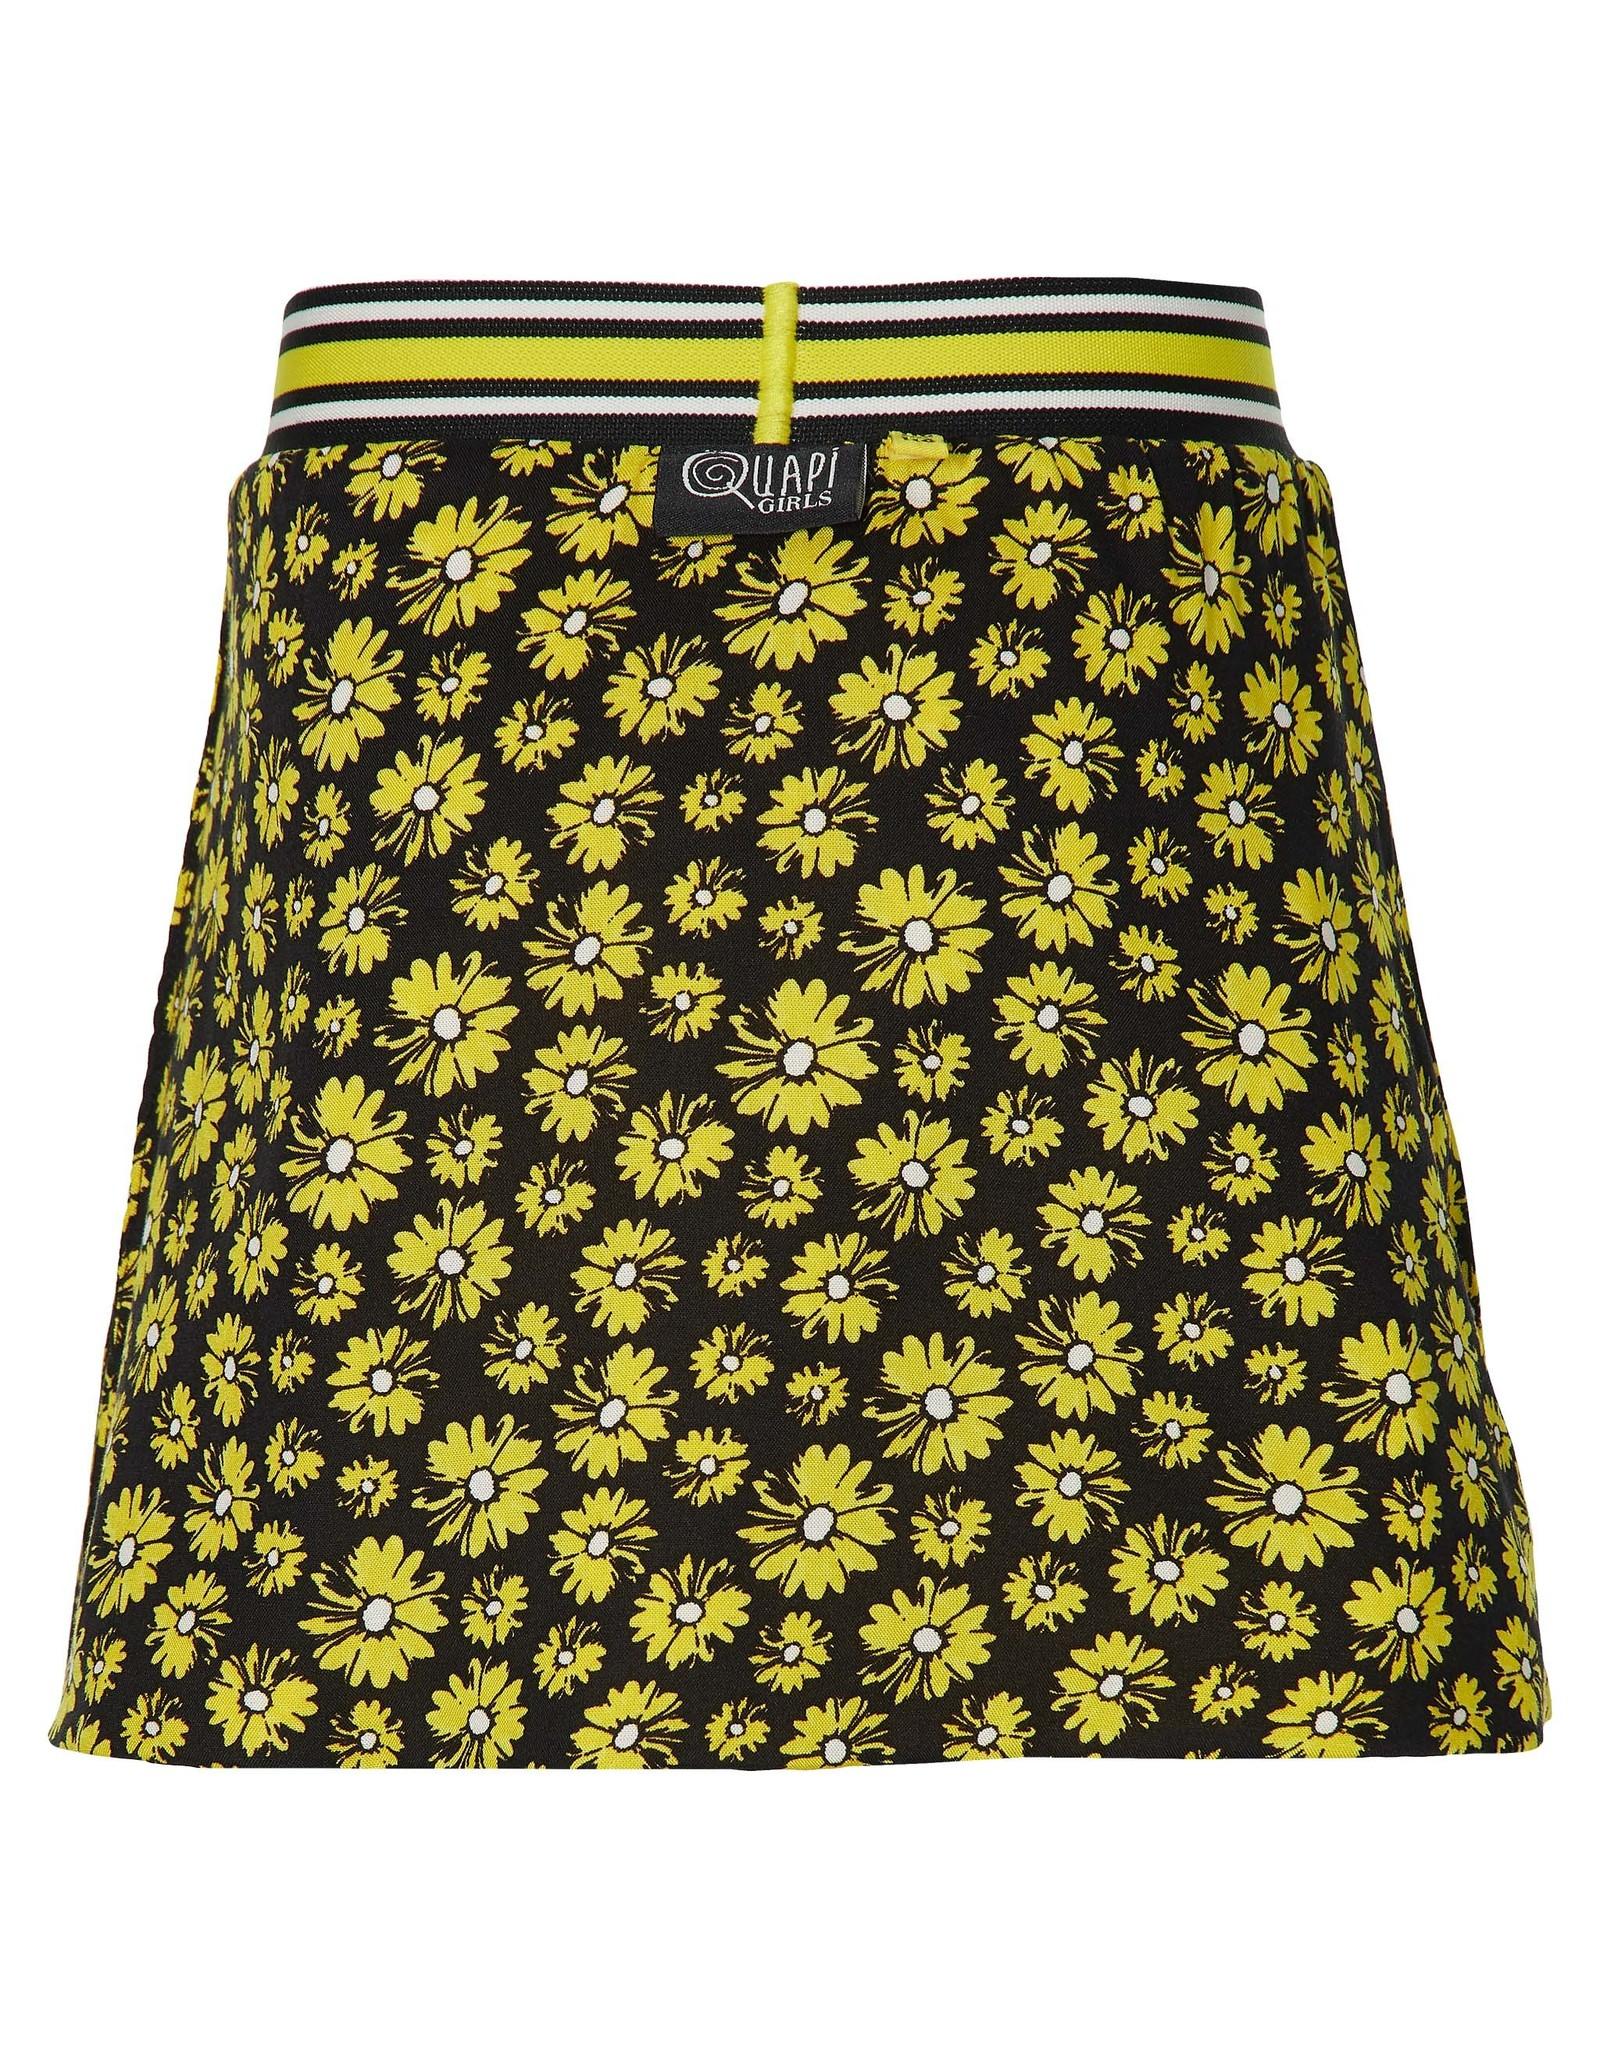 Quapi Quapi meisjes reversible rok Filijn Summer Yellow